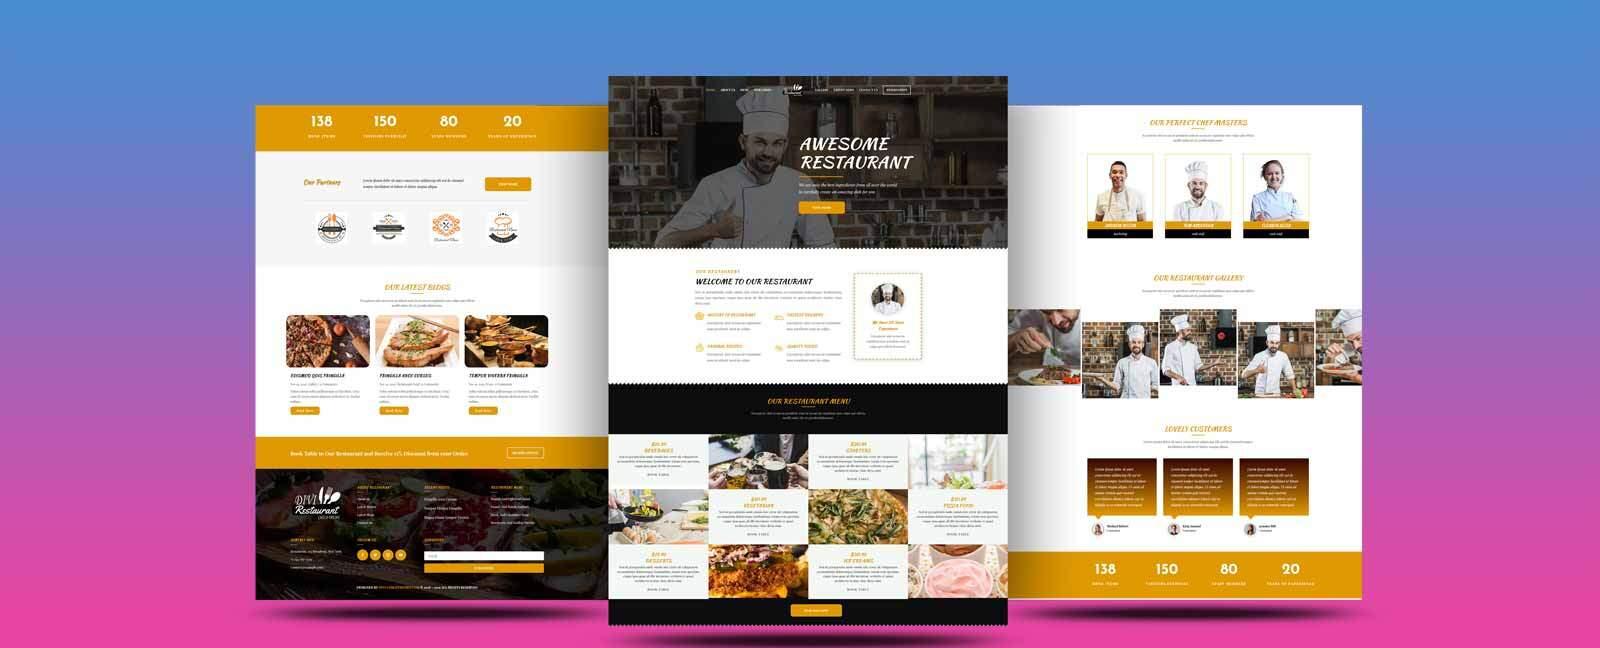 Get Best Restaurant Divi Child Theme For pizza, coffee, restaurant, hotels, pub or bar business.